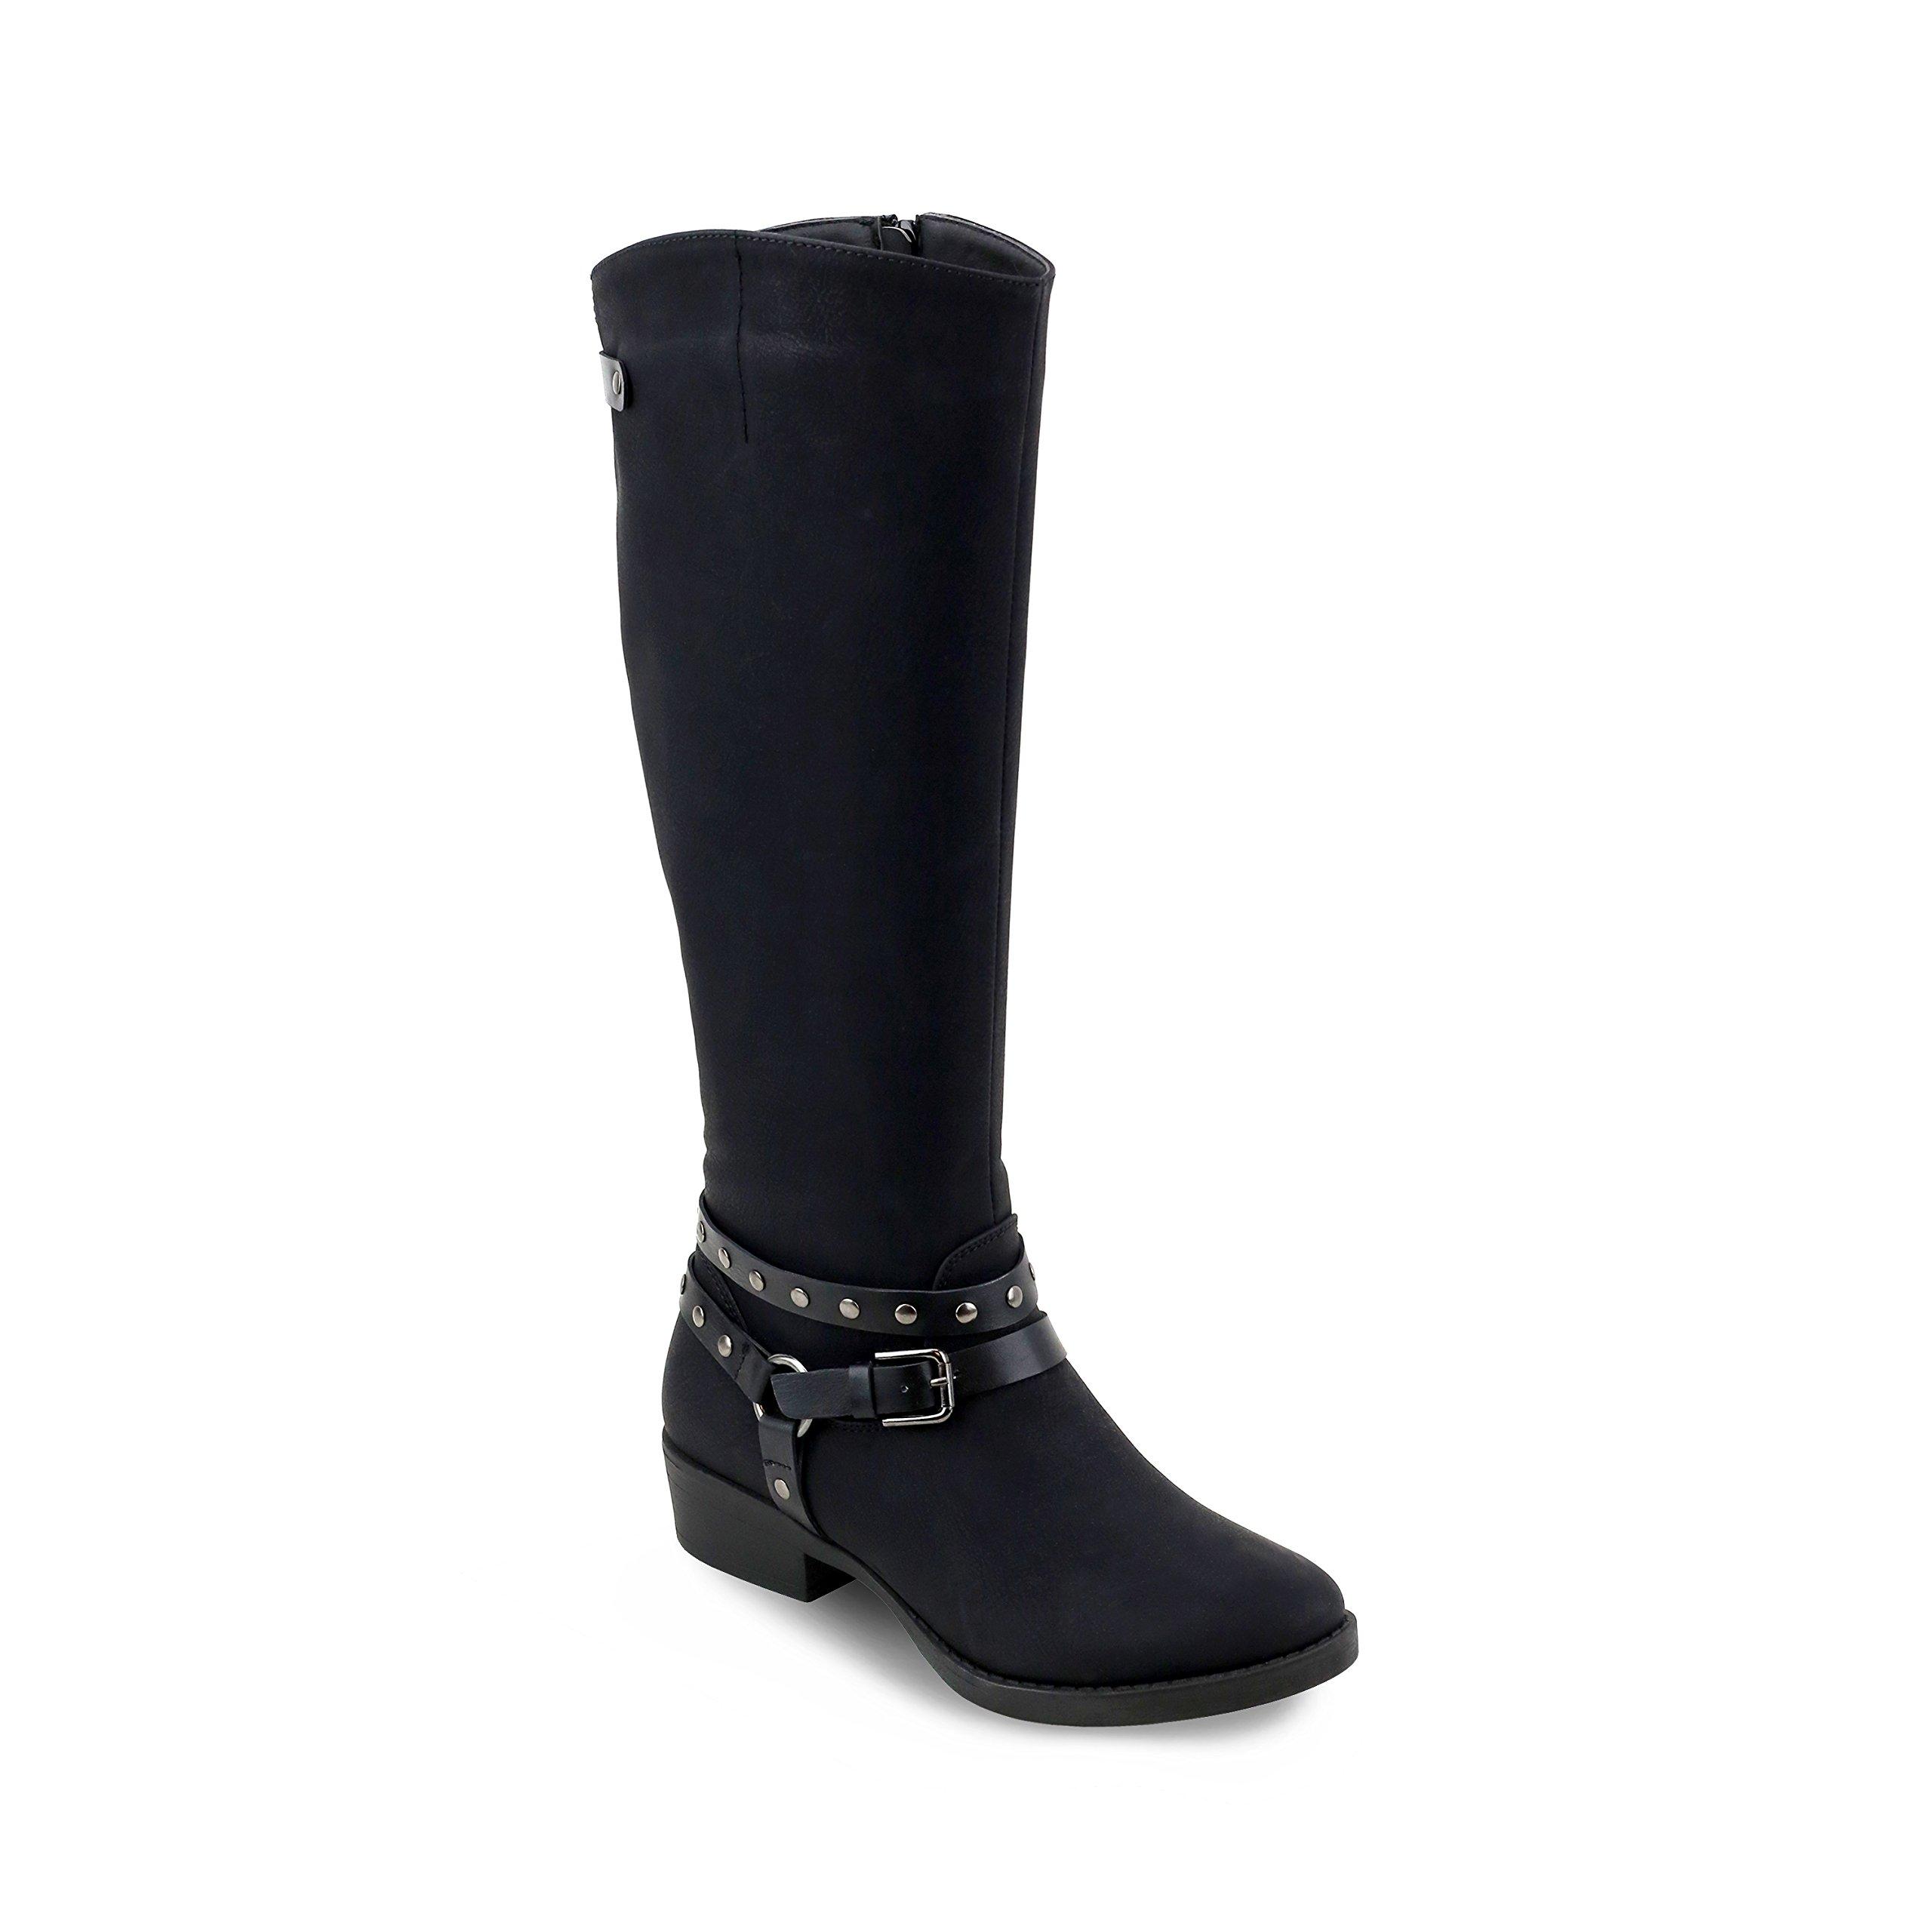 Olivia Miller Freeport' Multi Studded Strap Riding Boots KWOM 100 Oe Black 11